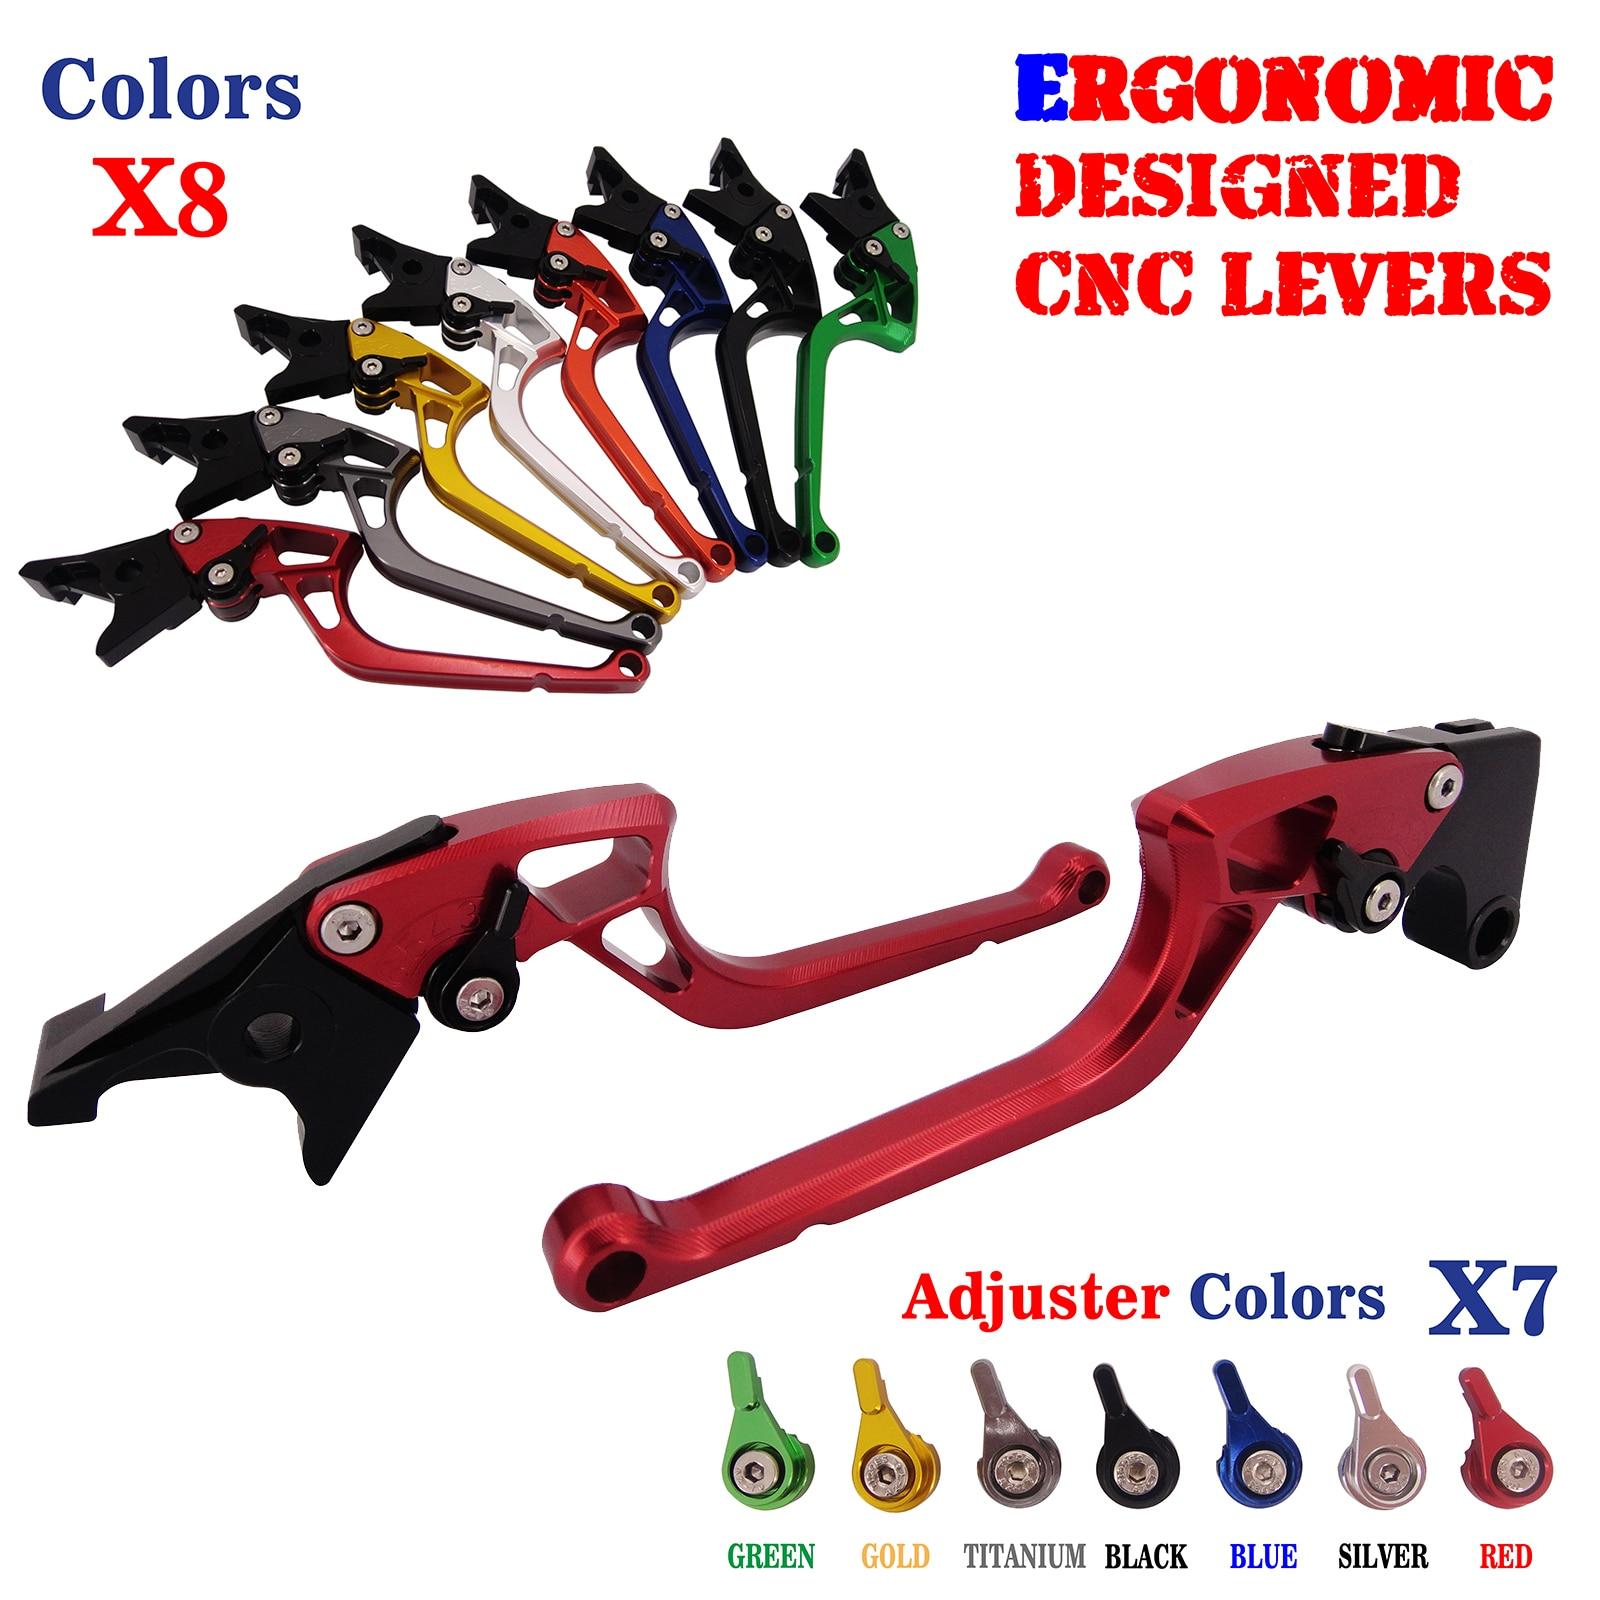 Unbreakable Ergonomic New CNC Adjustable Right-angled 170mm Brake Clutch Levers For Honda CBR250R CBR300R CBR500R CB500F/X billet new alu long folding adjustable brake clutch levers for honda cbr250r cbr 250 r 11 13 cbr300r 14 cbr500r cb500f x 13 14